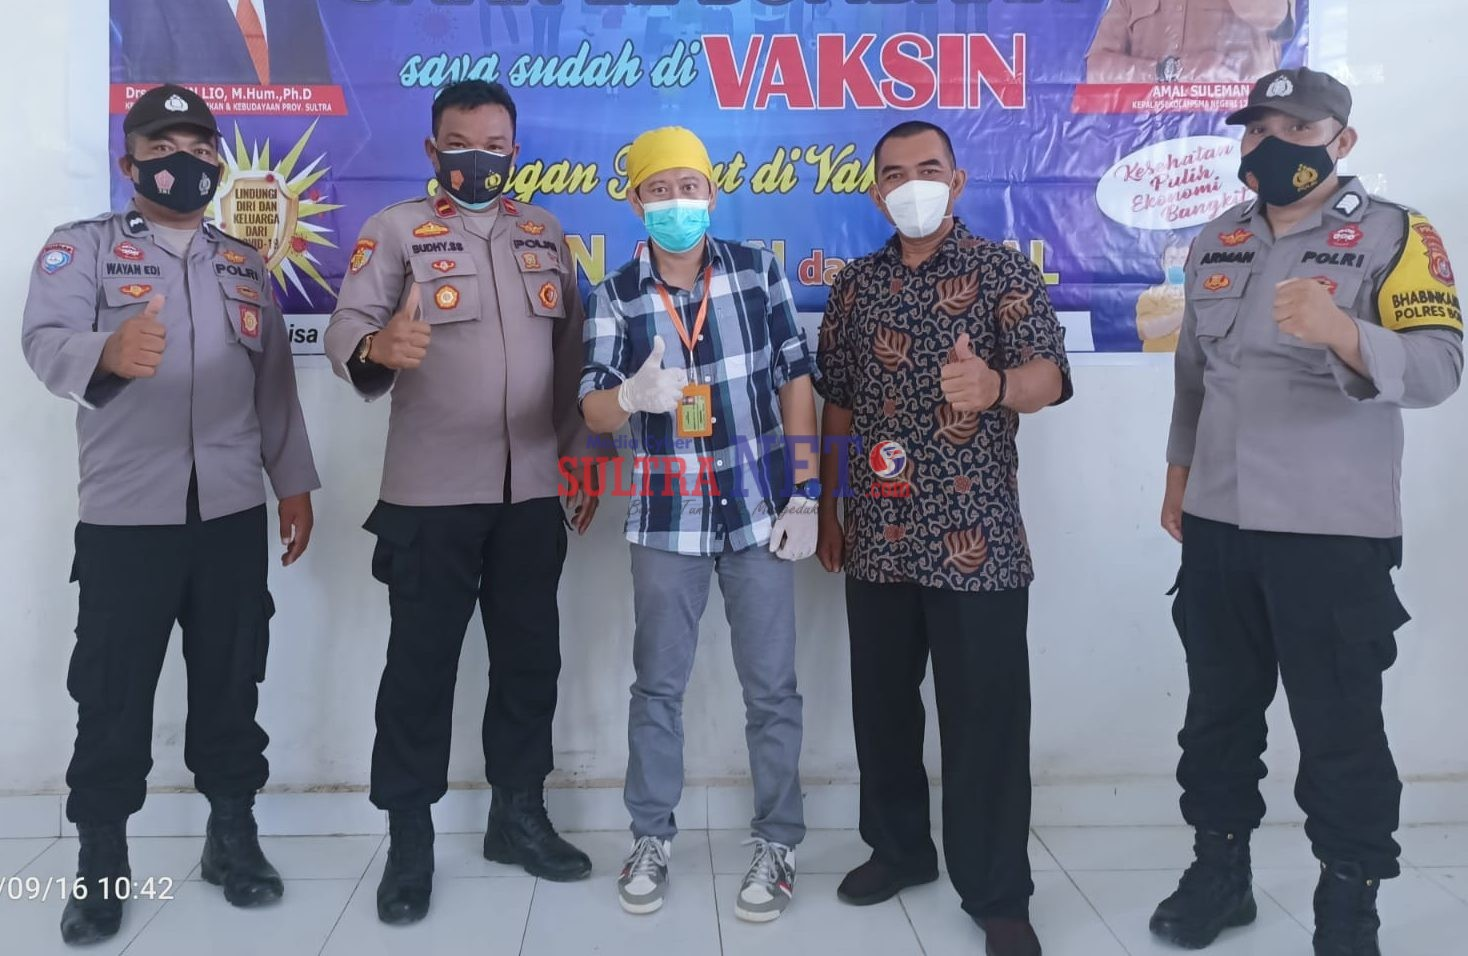 Kapolsek Lantari Jaya IPDA Setyabudi Satrianto SH (Kedua dari Kiri)